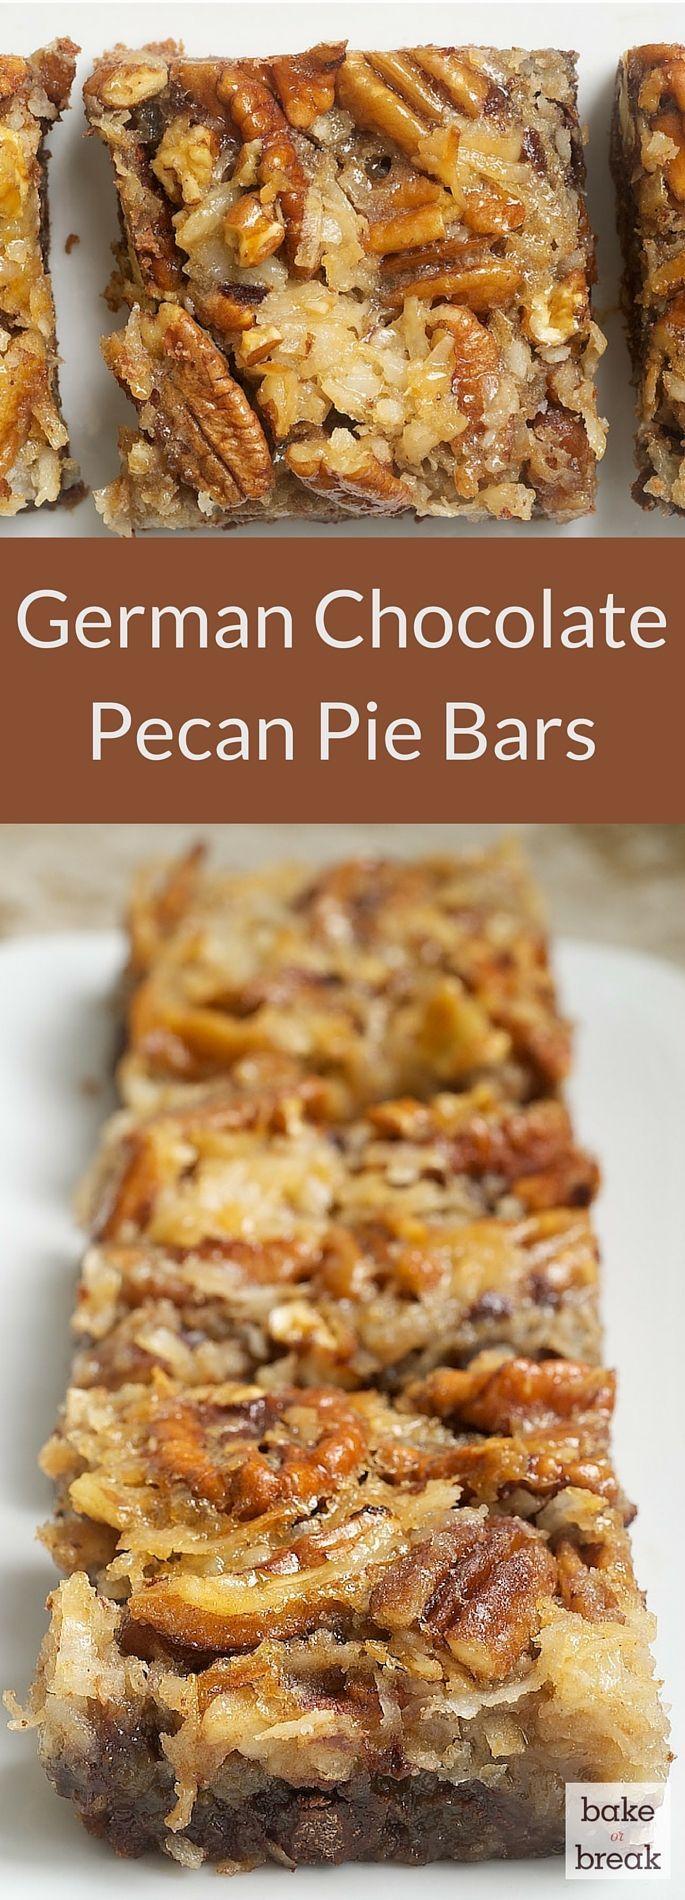 Best 20+ German chocolate bars ideas on Pinterest | German ...